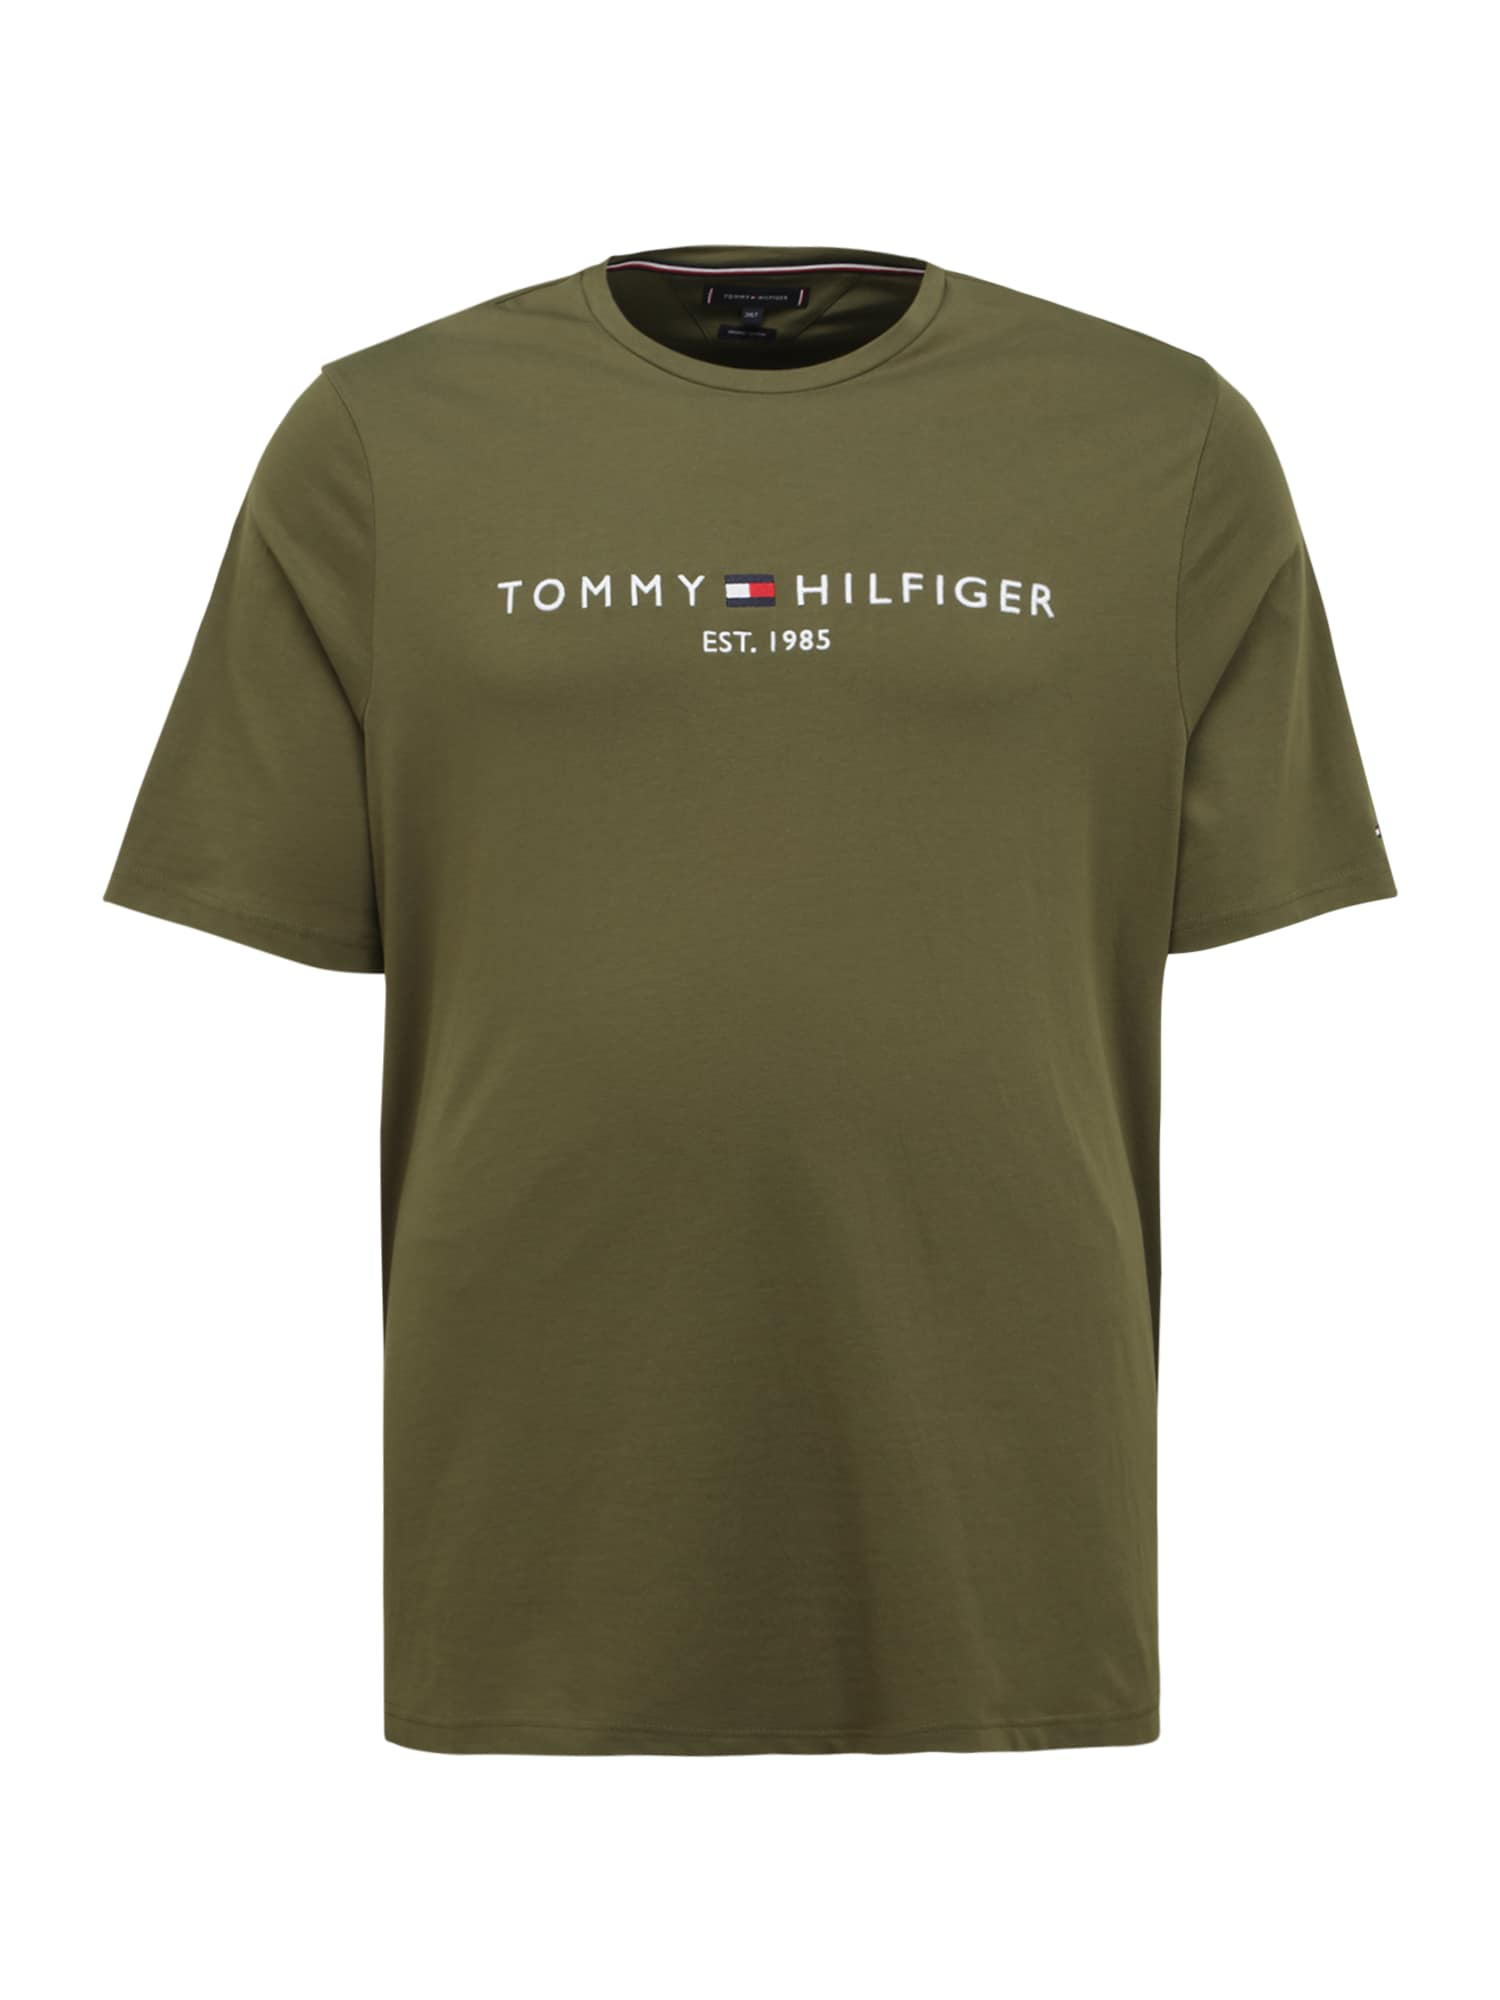 Tommy Hilfiger Big & Tall Marškinėliai alyvuogių spalva / balta